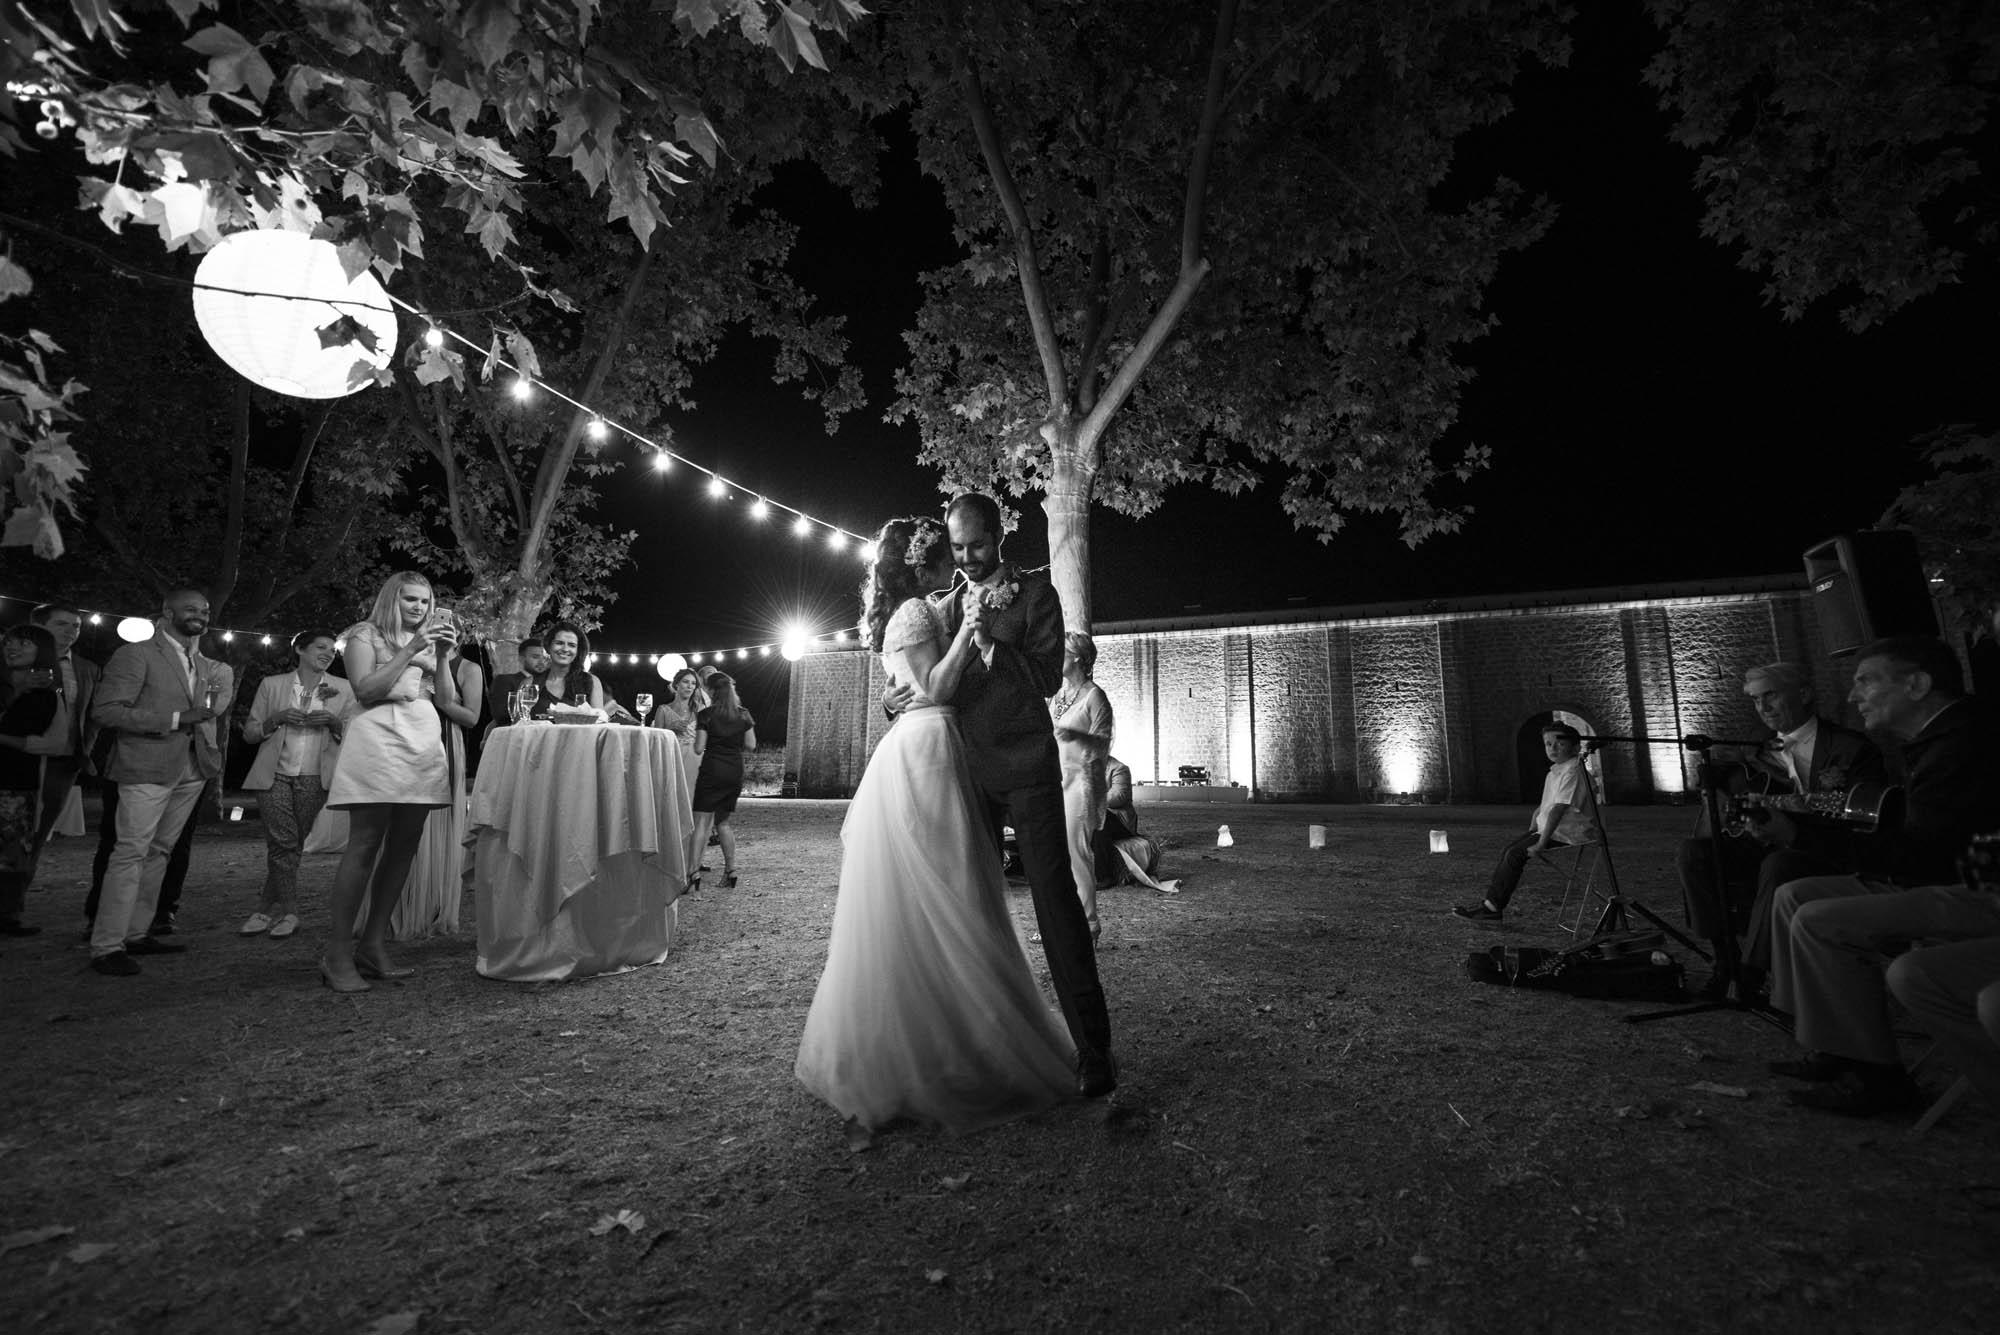 WEDDING-PHOTOGRAPHY-IN-CORSICA_013.jpg